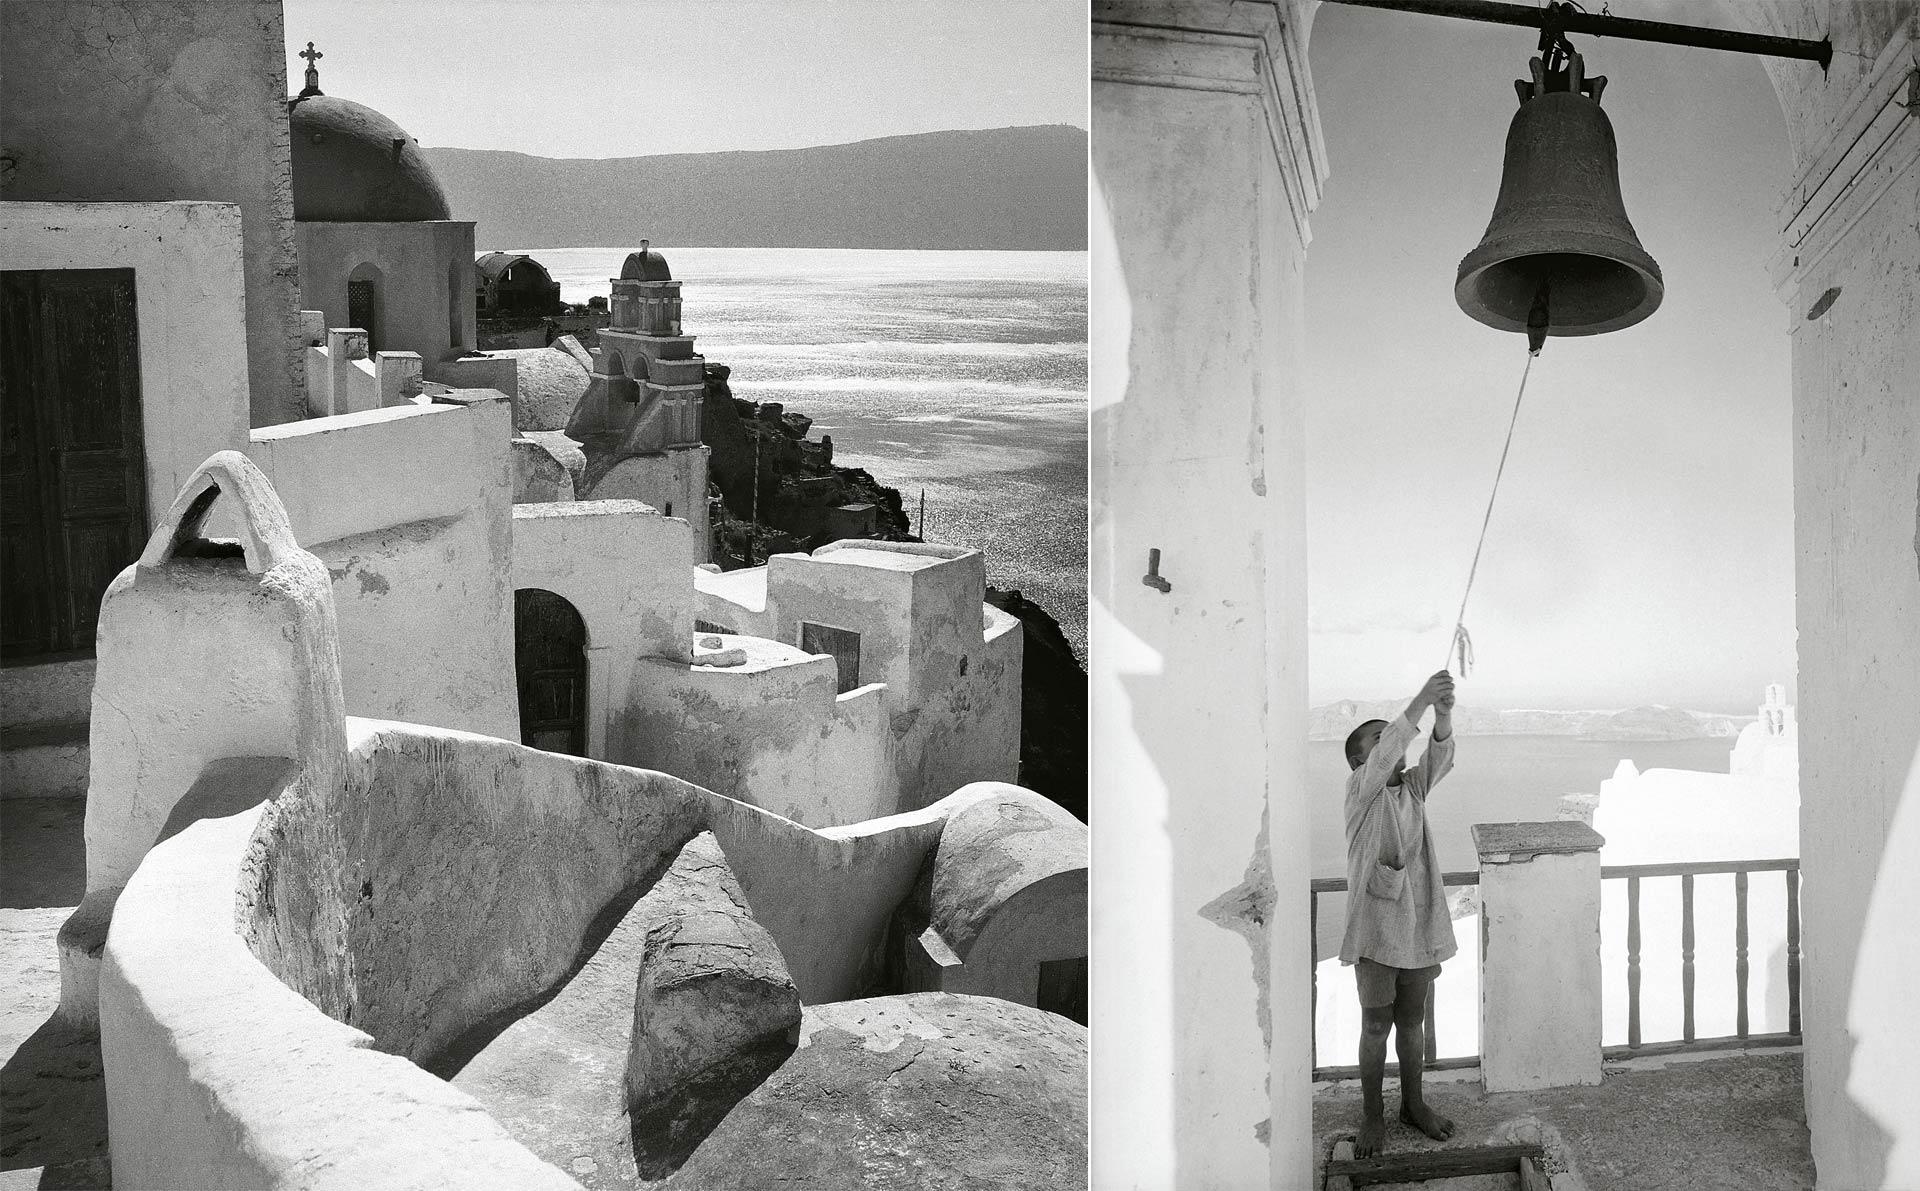 <h5>(L) Oia, Santorini, 1950-1955  (R) Santorini, 1930</h5>